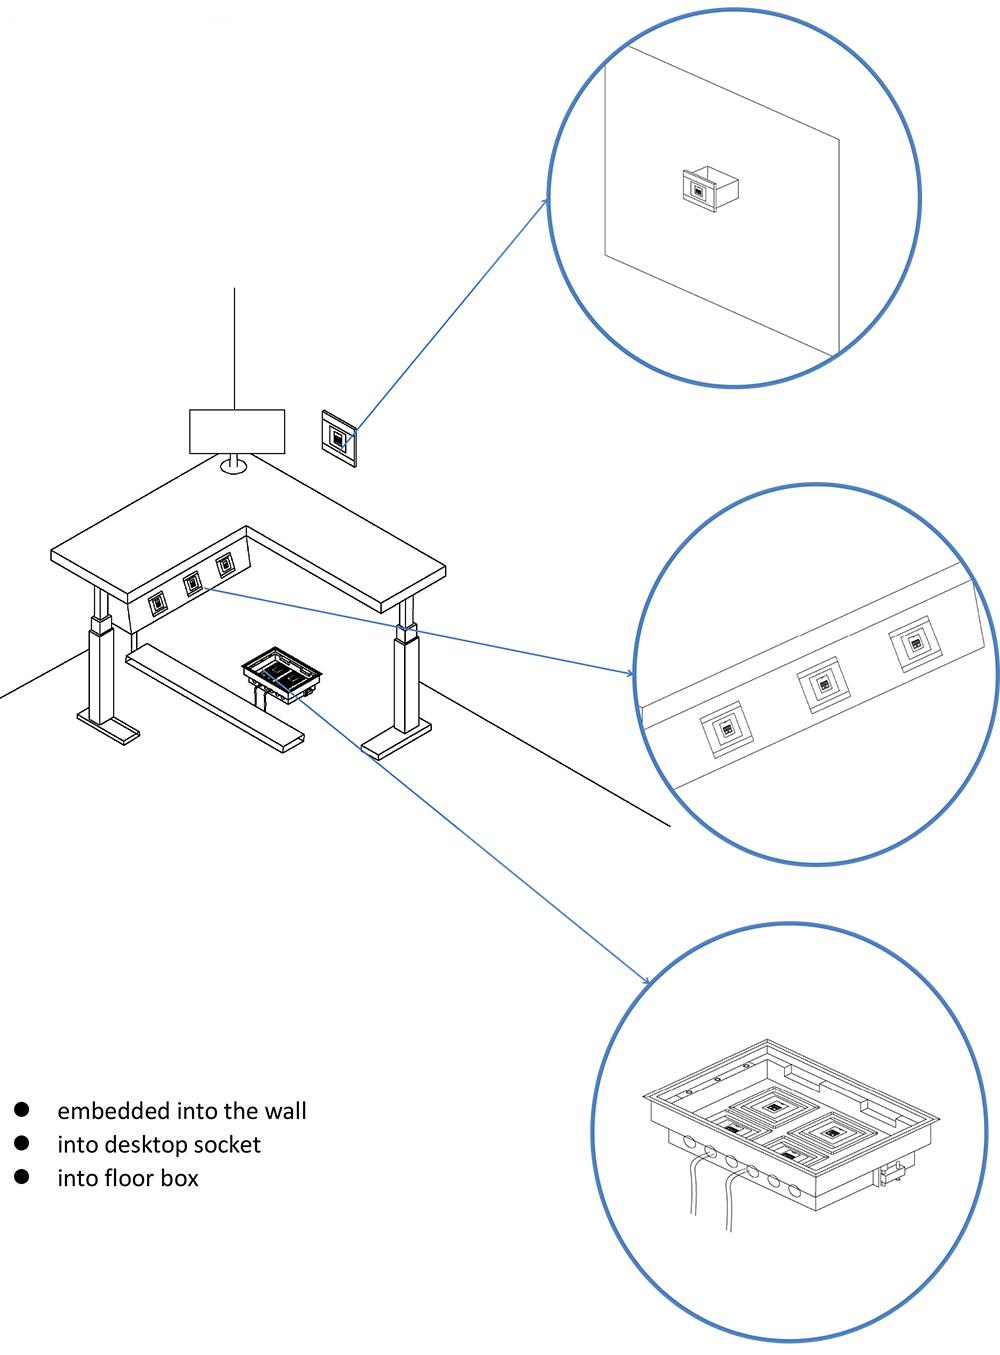 Safewire Datasheet 128 type XJY-USB-50-B-A-C M190808-3